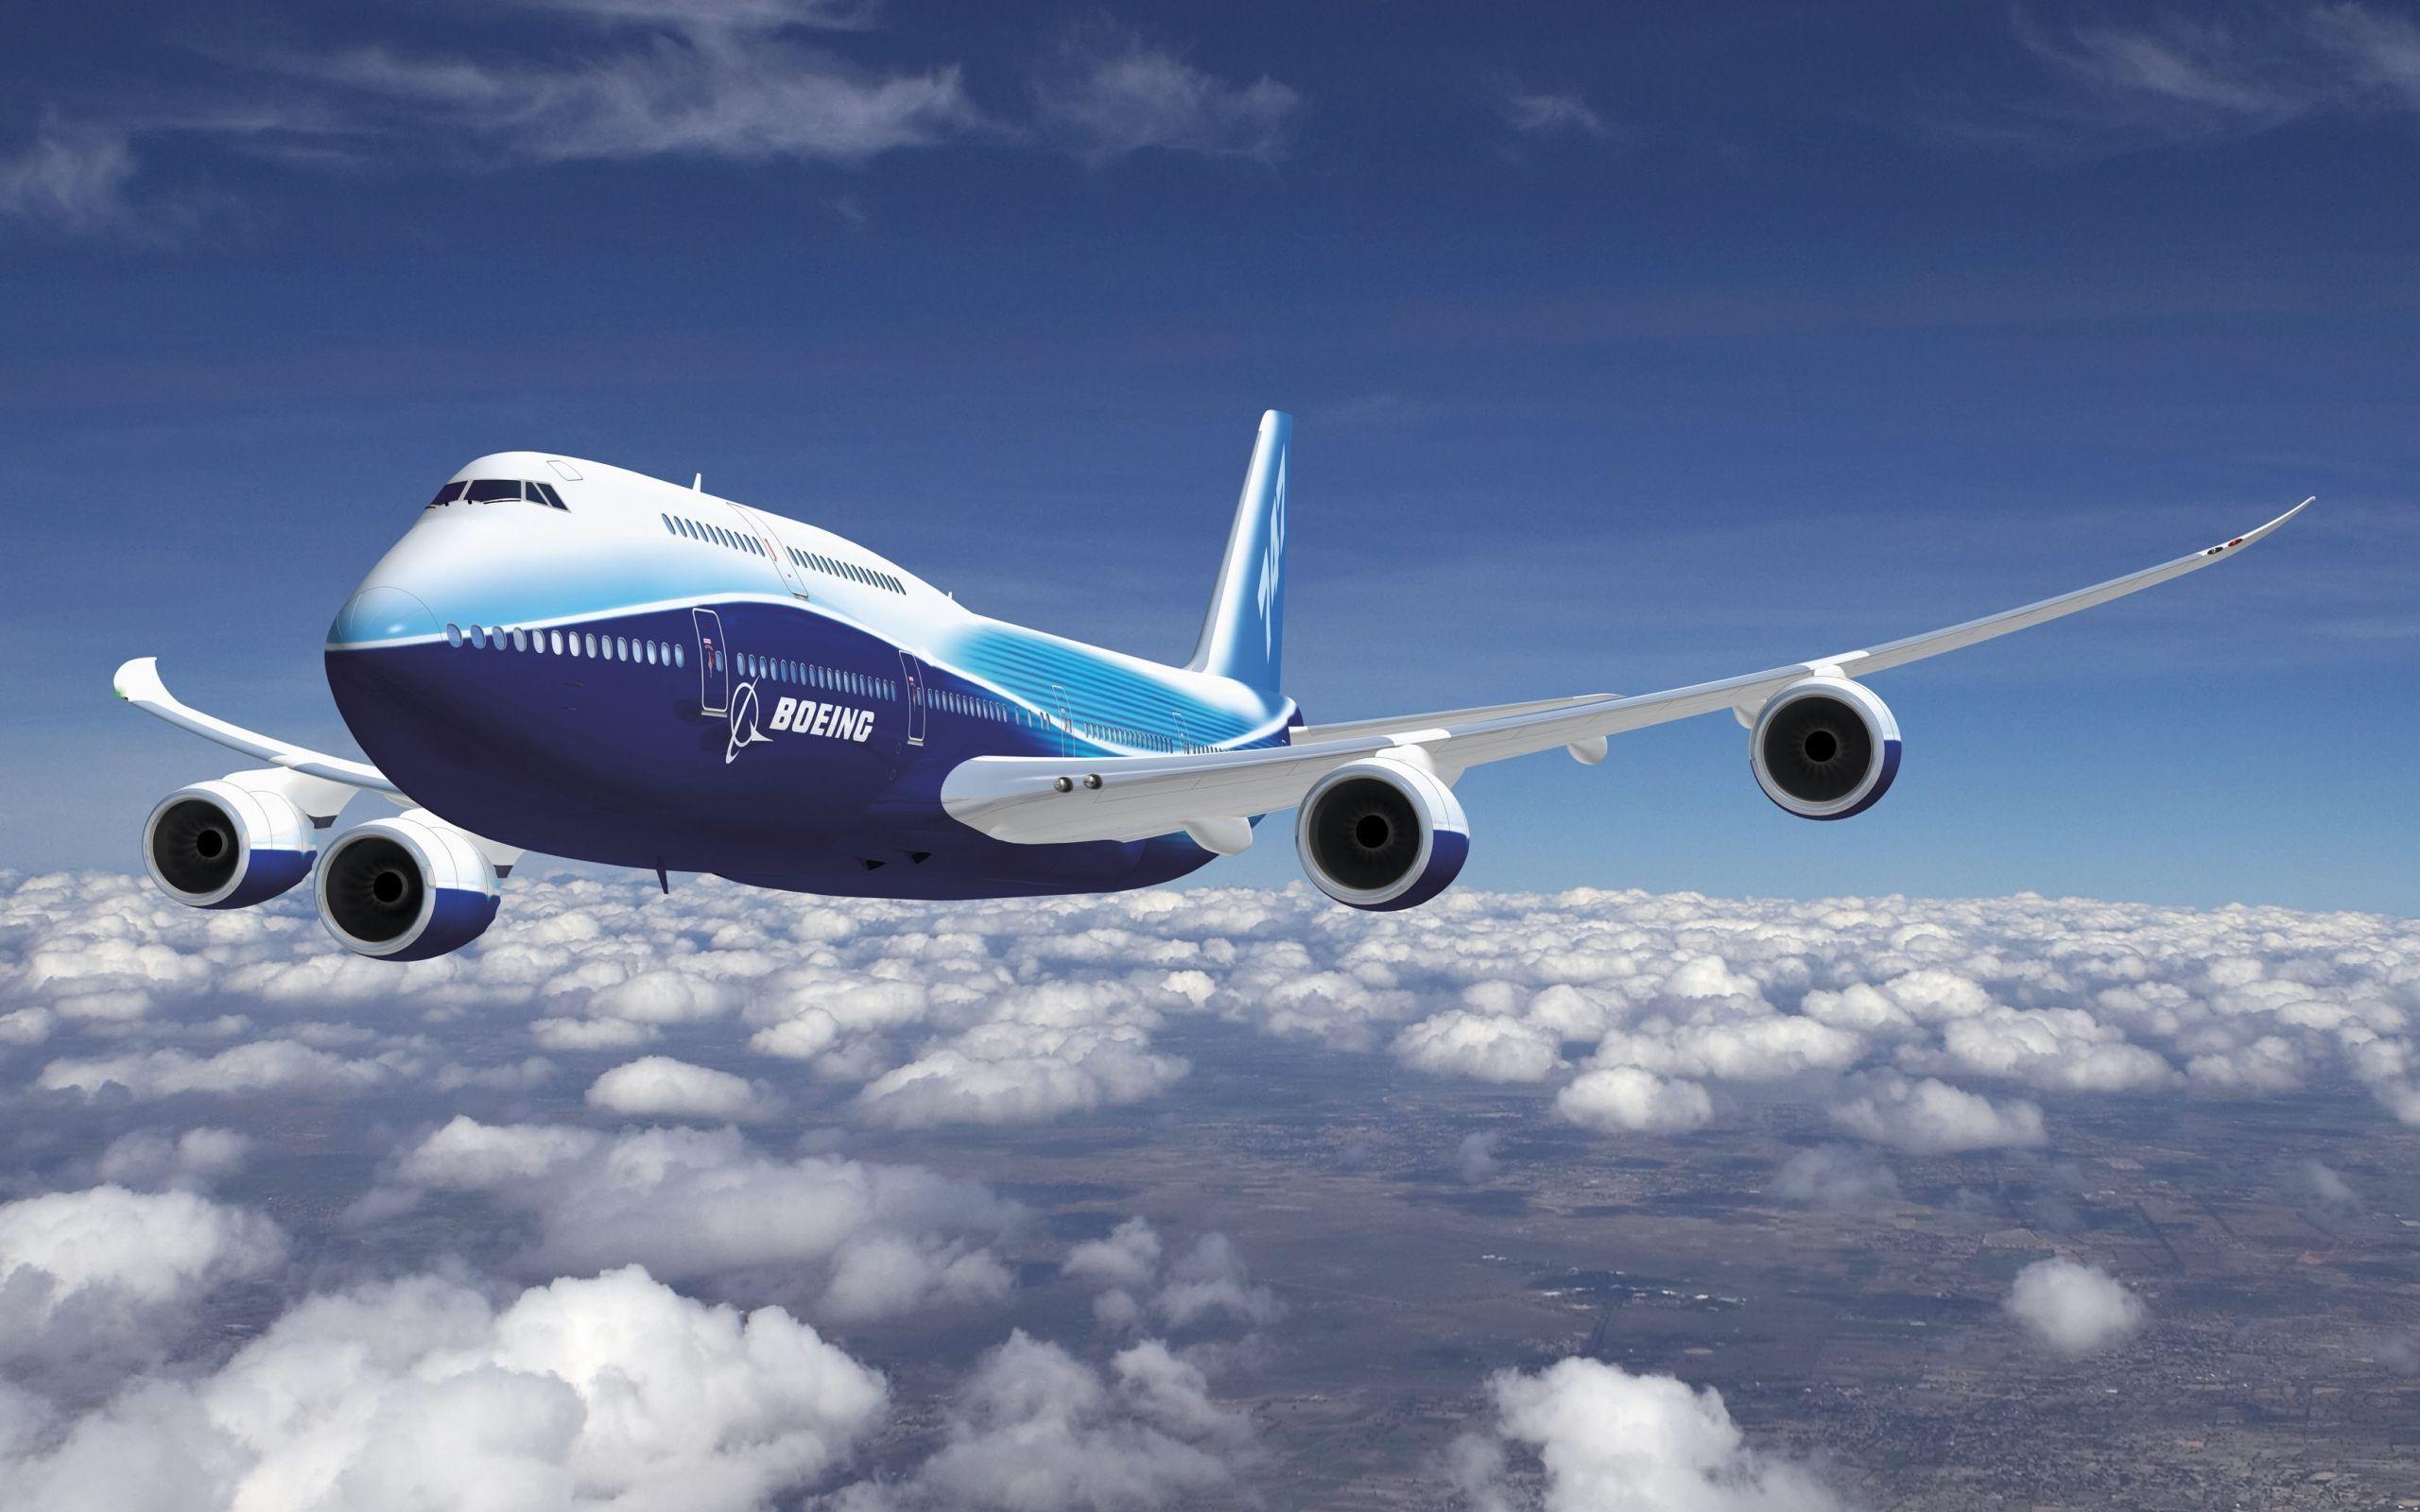 Planes 4k Ultra Hd Wallpapers Top Free Planes 4k Ultra Hd